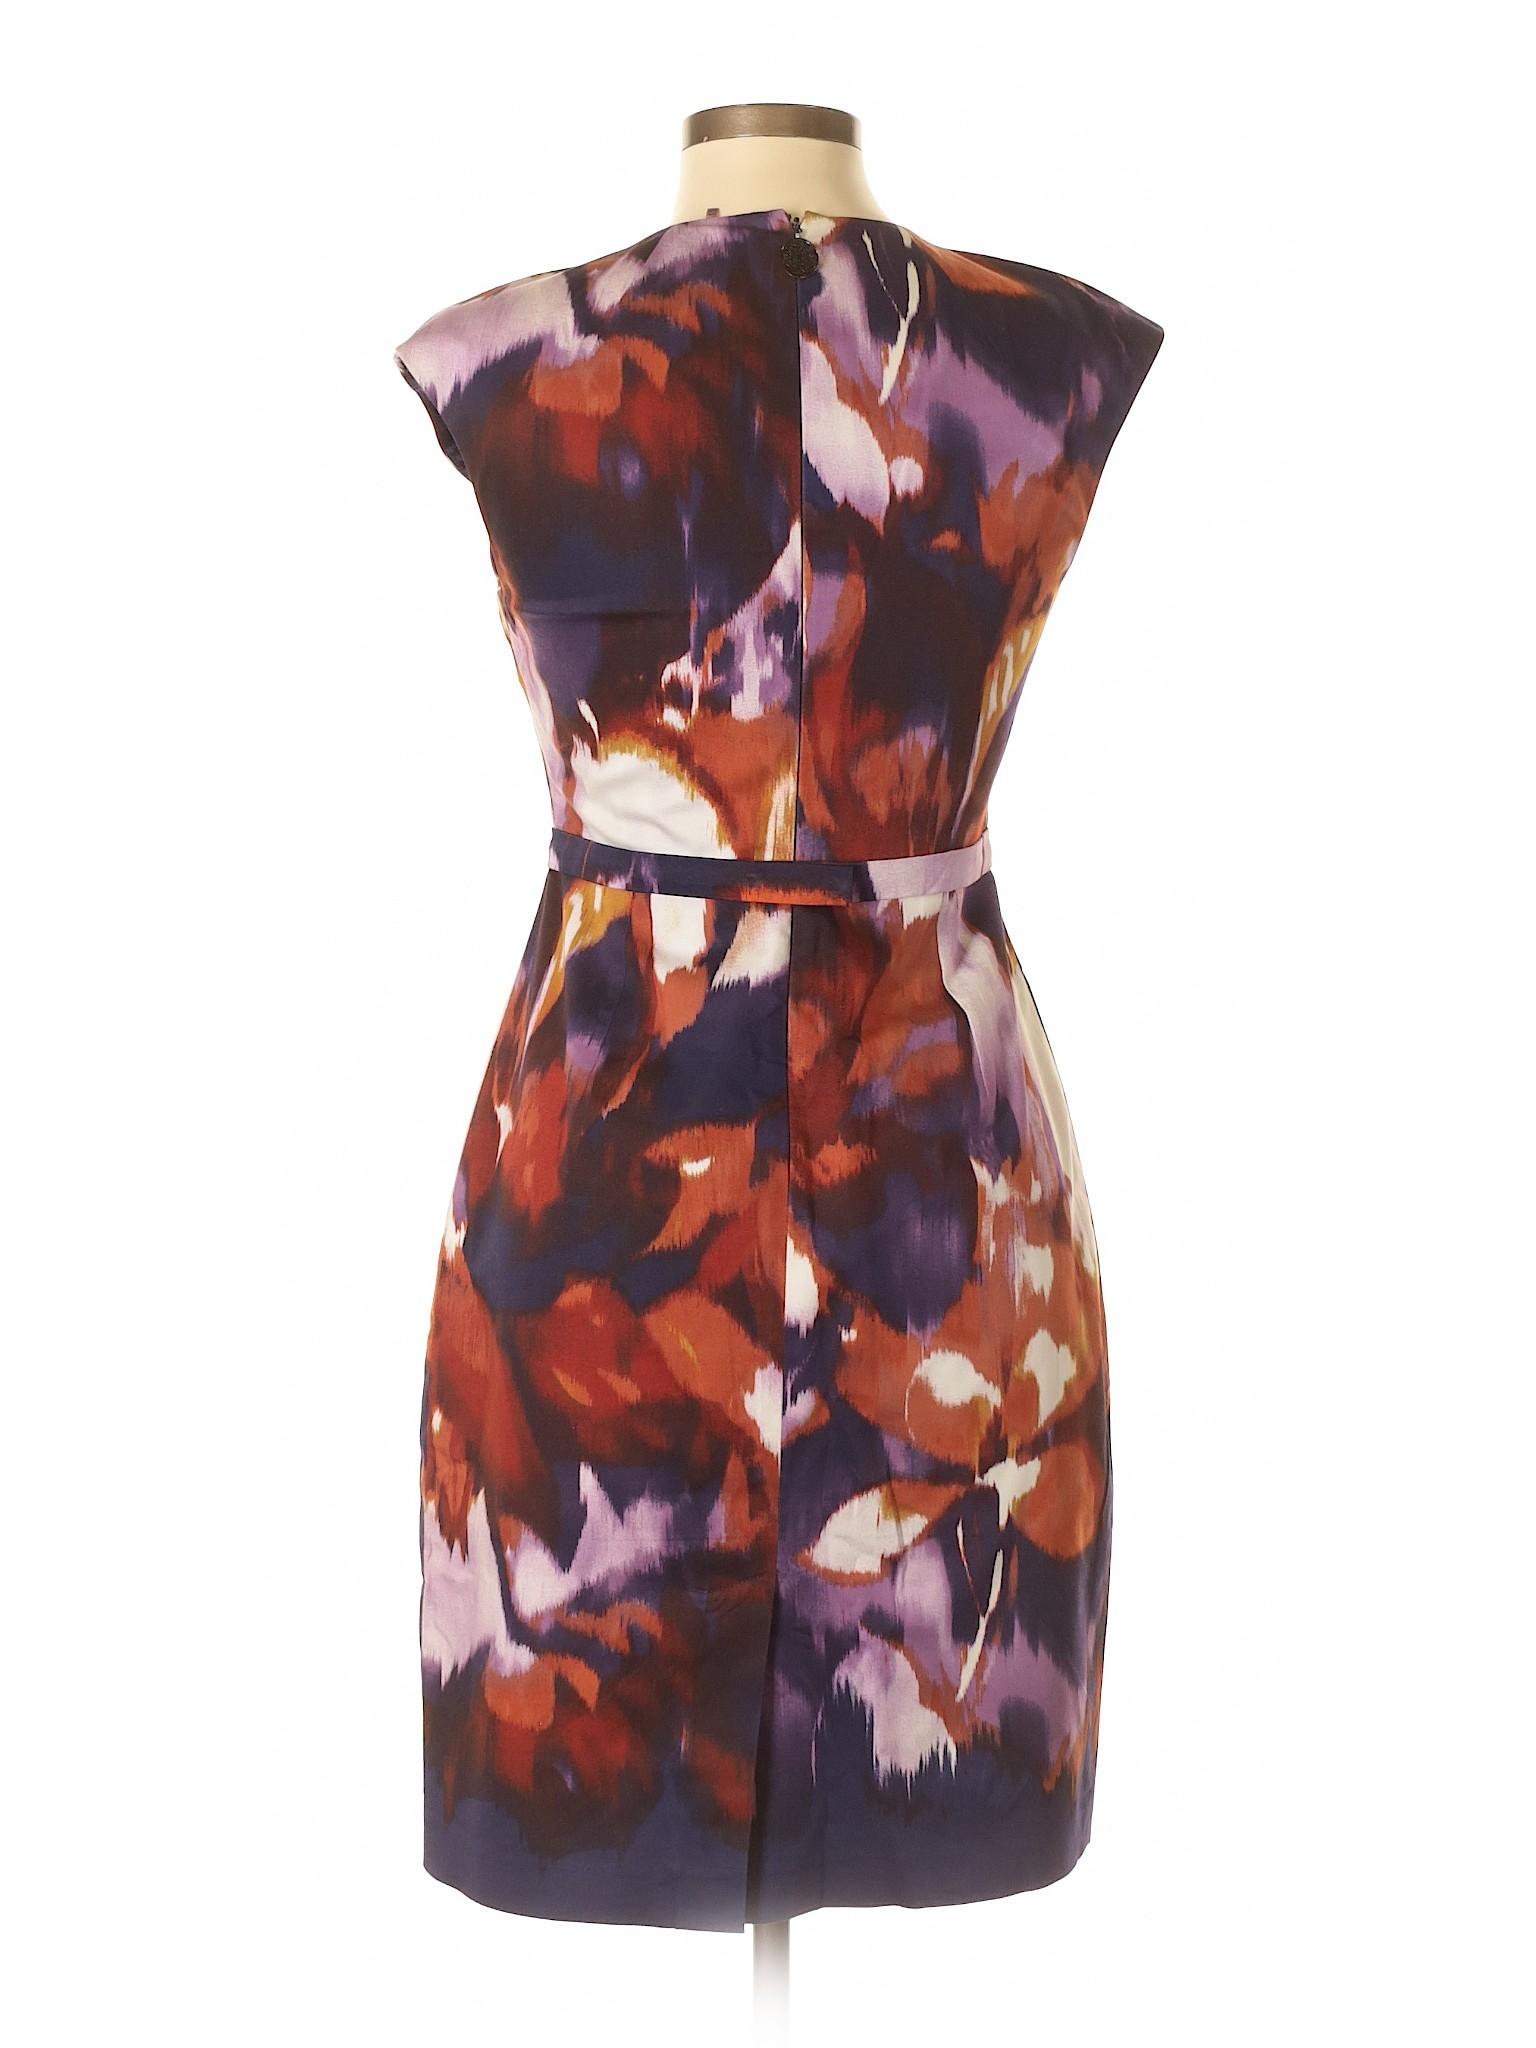 Tahari Dress Dress Tahari Casual Selling Elie Elie Selling Casual Bqq7CwY